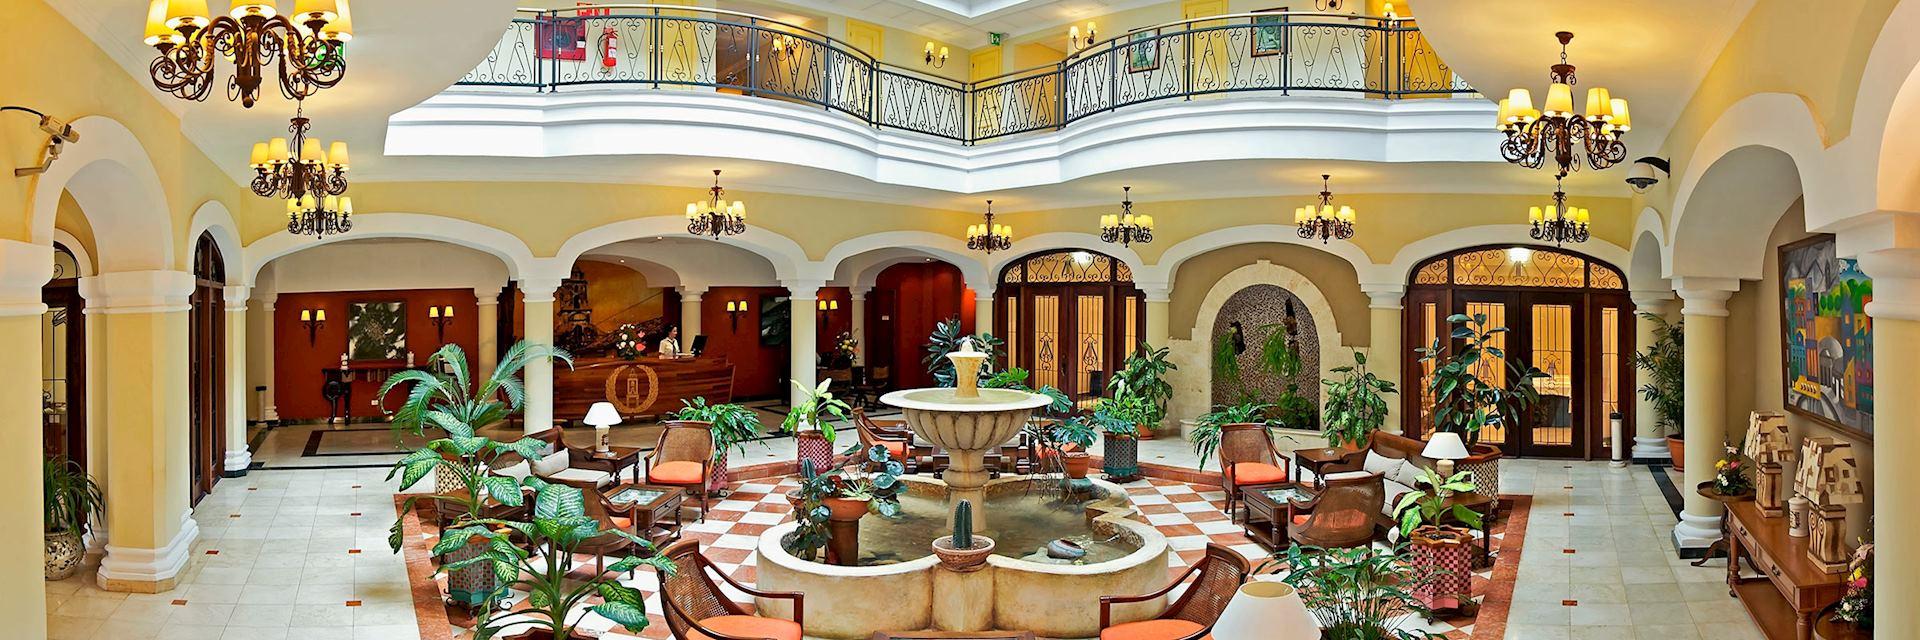 Iberostar Grand Hotel, Cuba